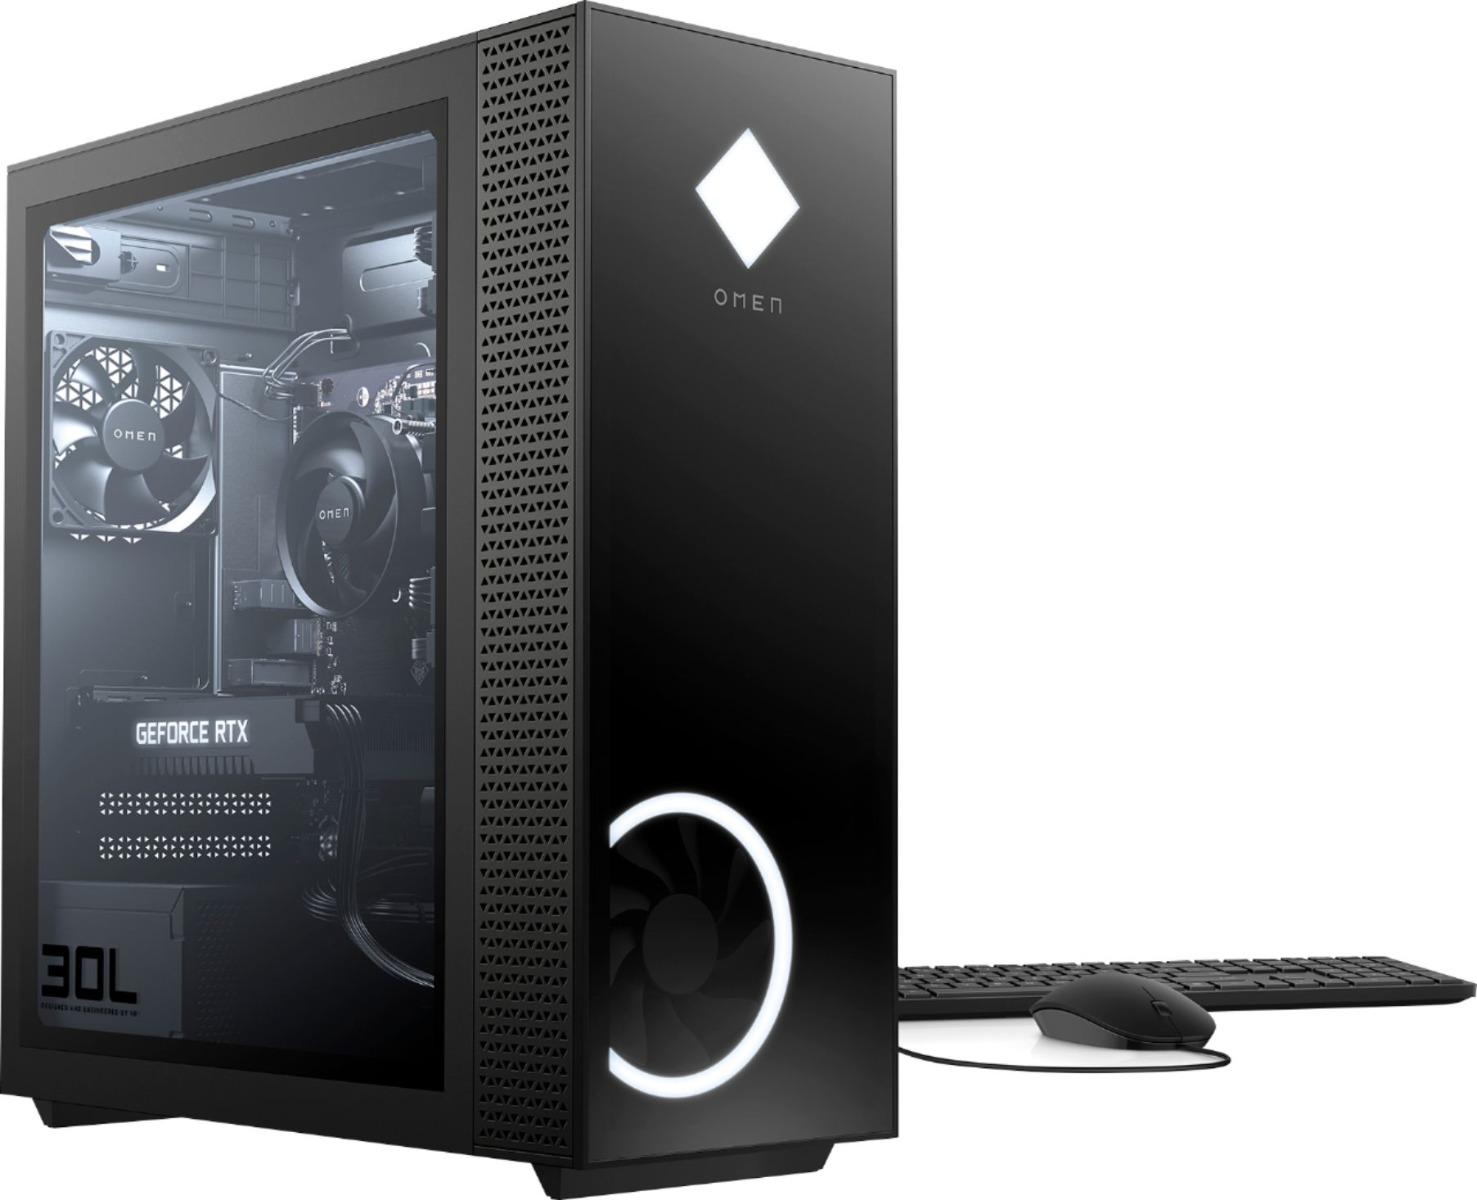 HP OMEN - Gaming Desktop - AMD Ryzen 7-Series - 3700X - 16GB Memory - NVIDIA GeForce RTX 2060 - 1TB HDD + 256GB SSD - Black